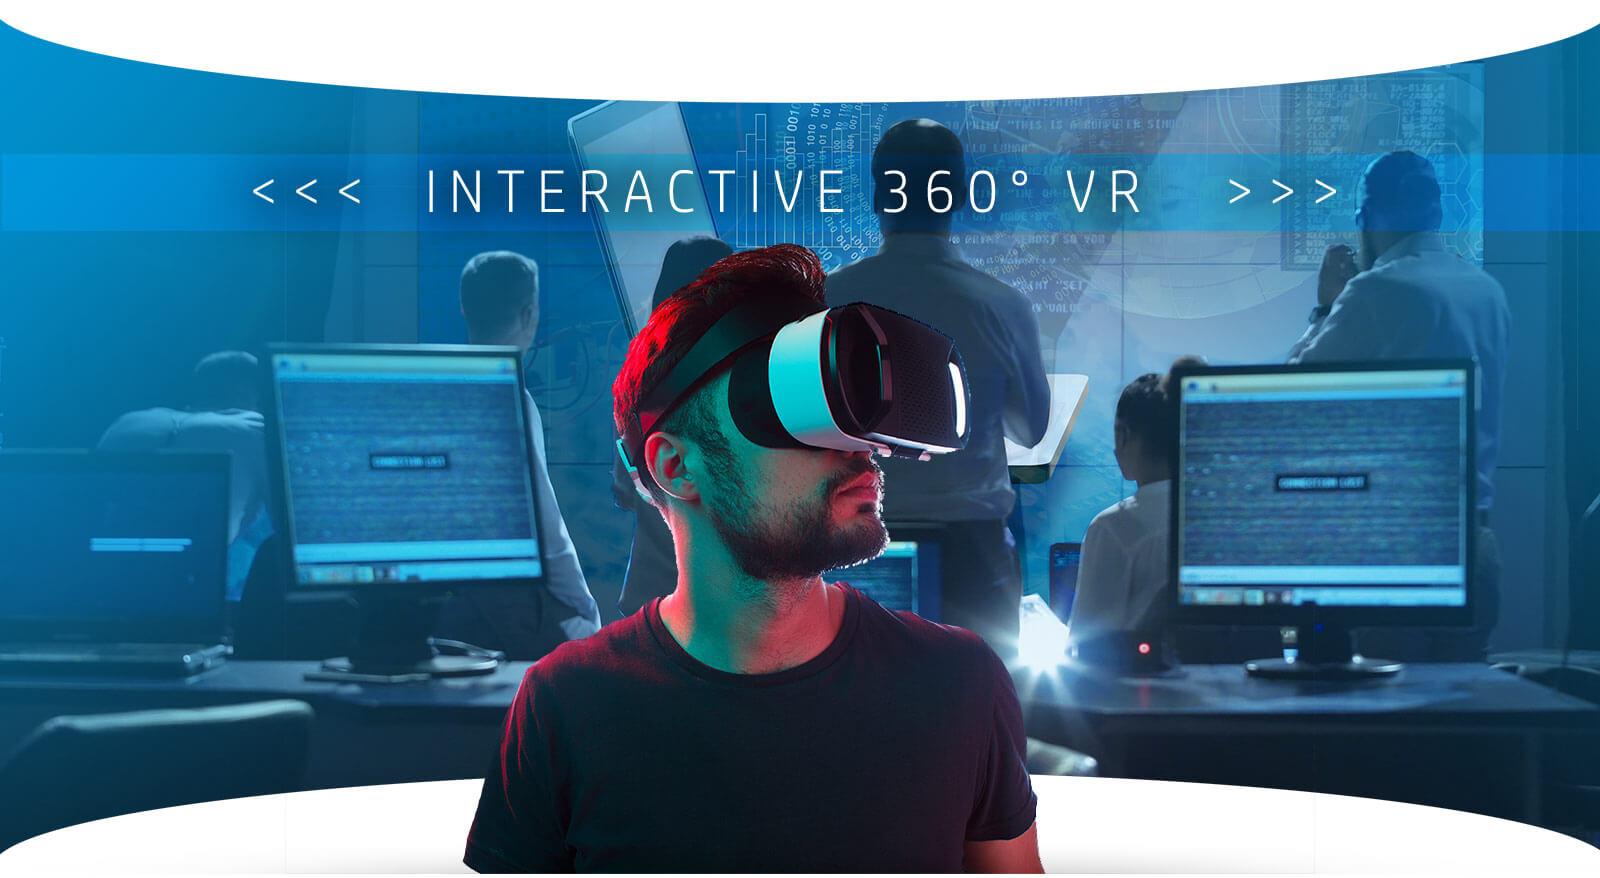 HP VR Image